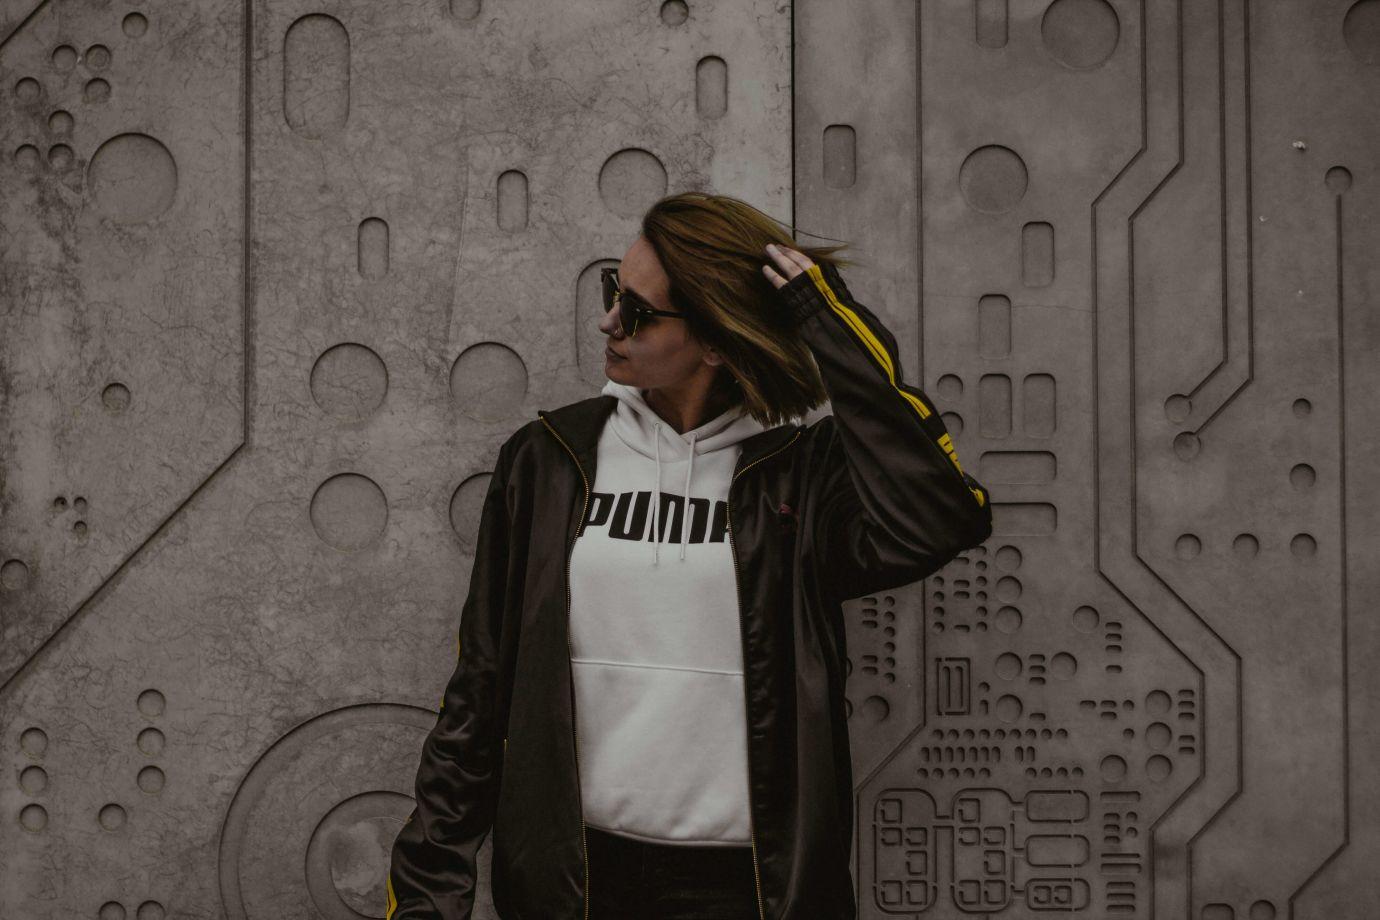 Frau im Puma Hoodie vor einer Wand